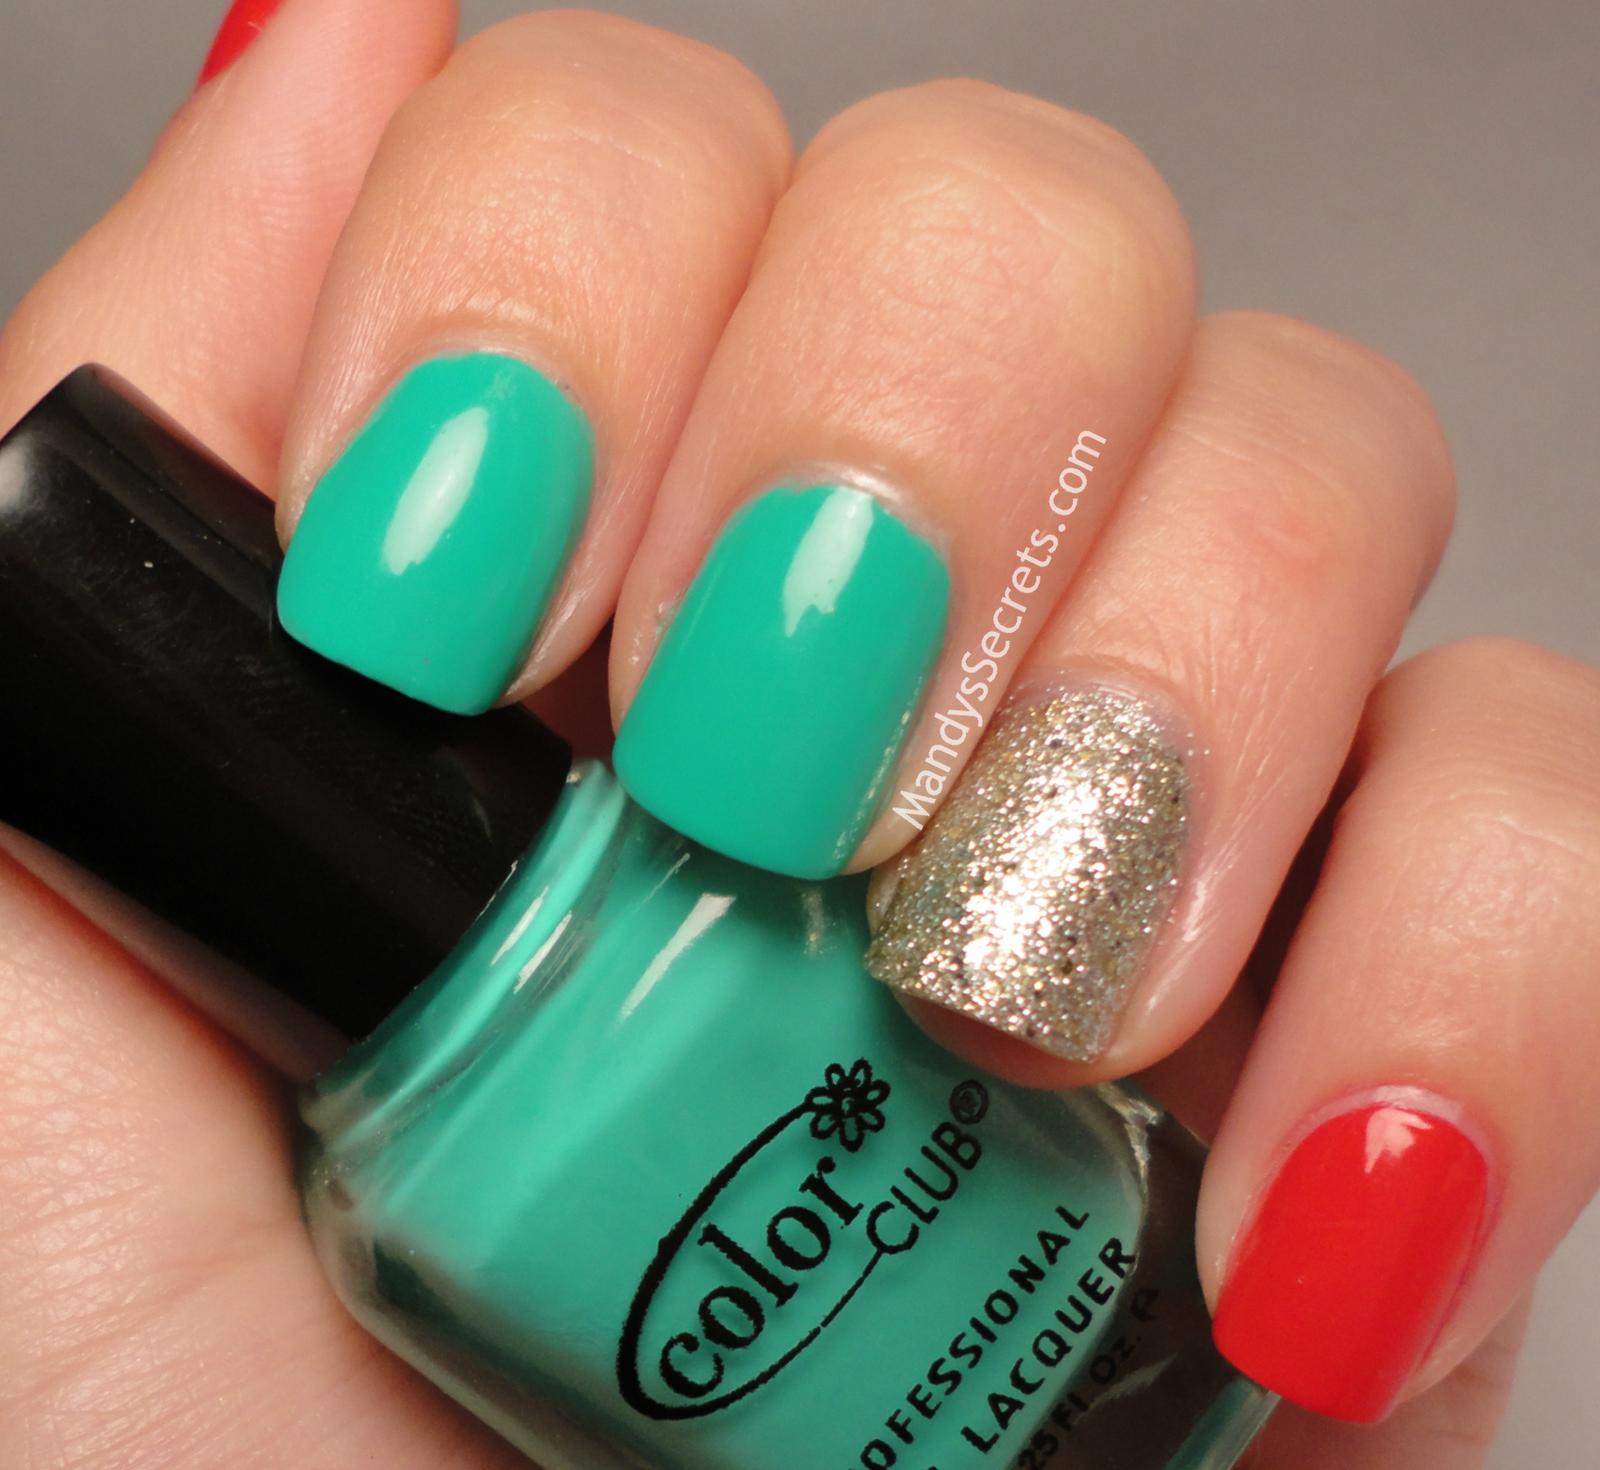 Coral Turquoise Glitter Nails - Uñas coral, turquesa y brillos ...